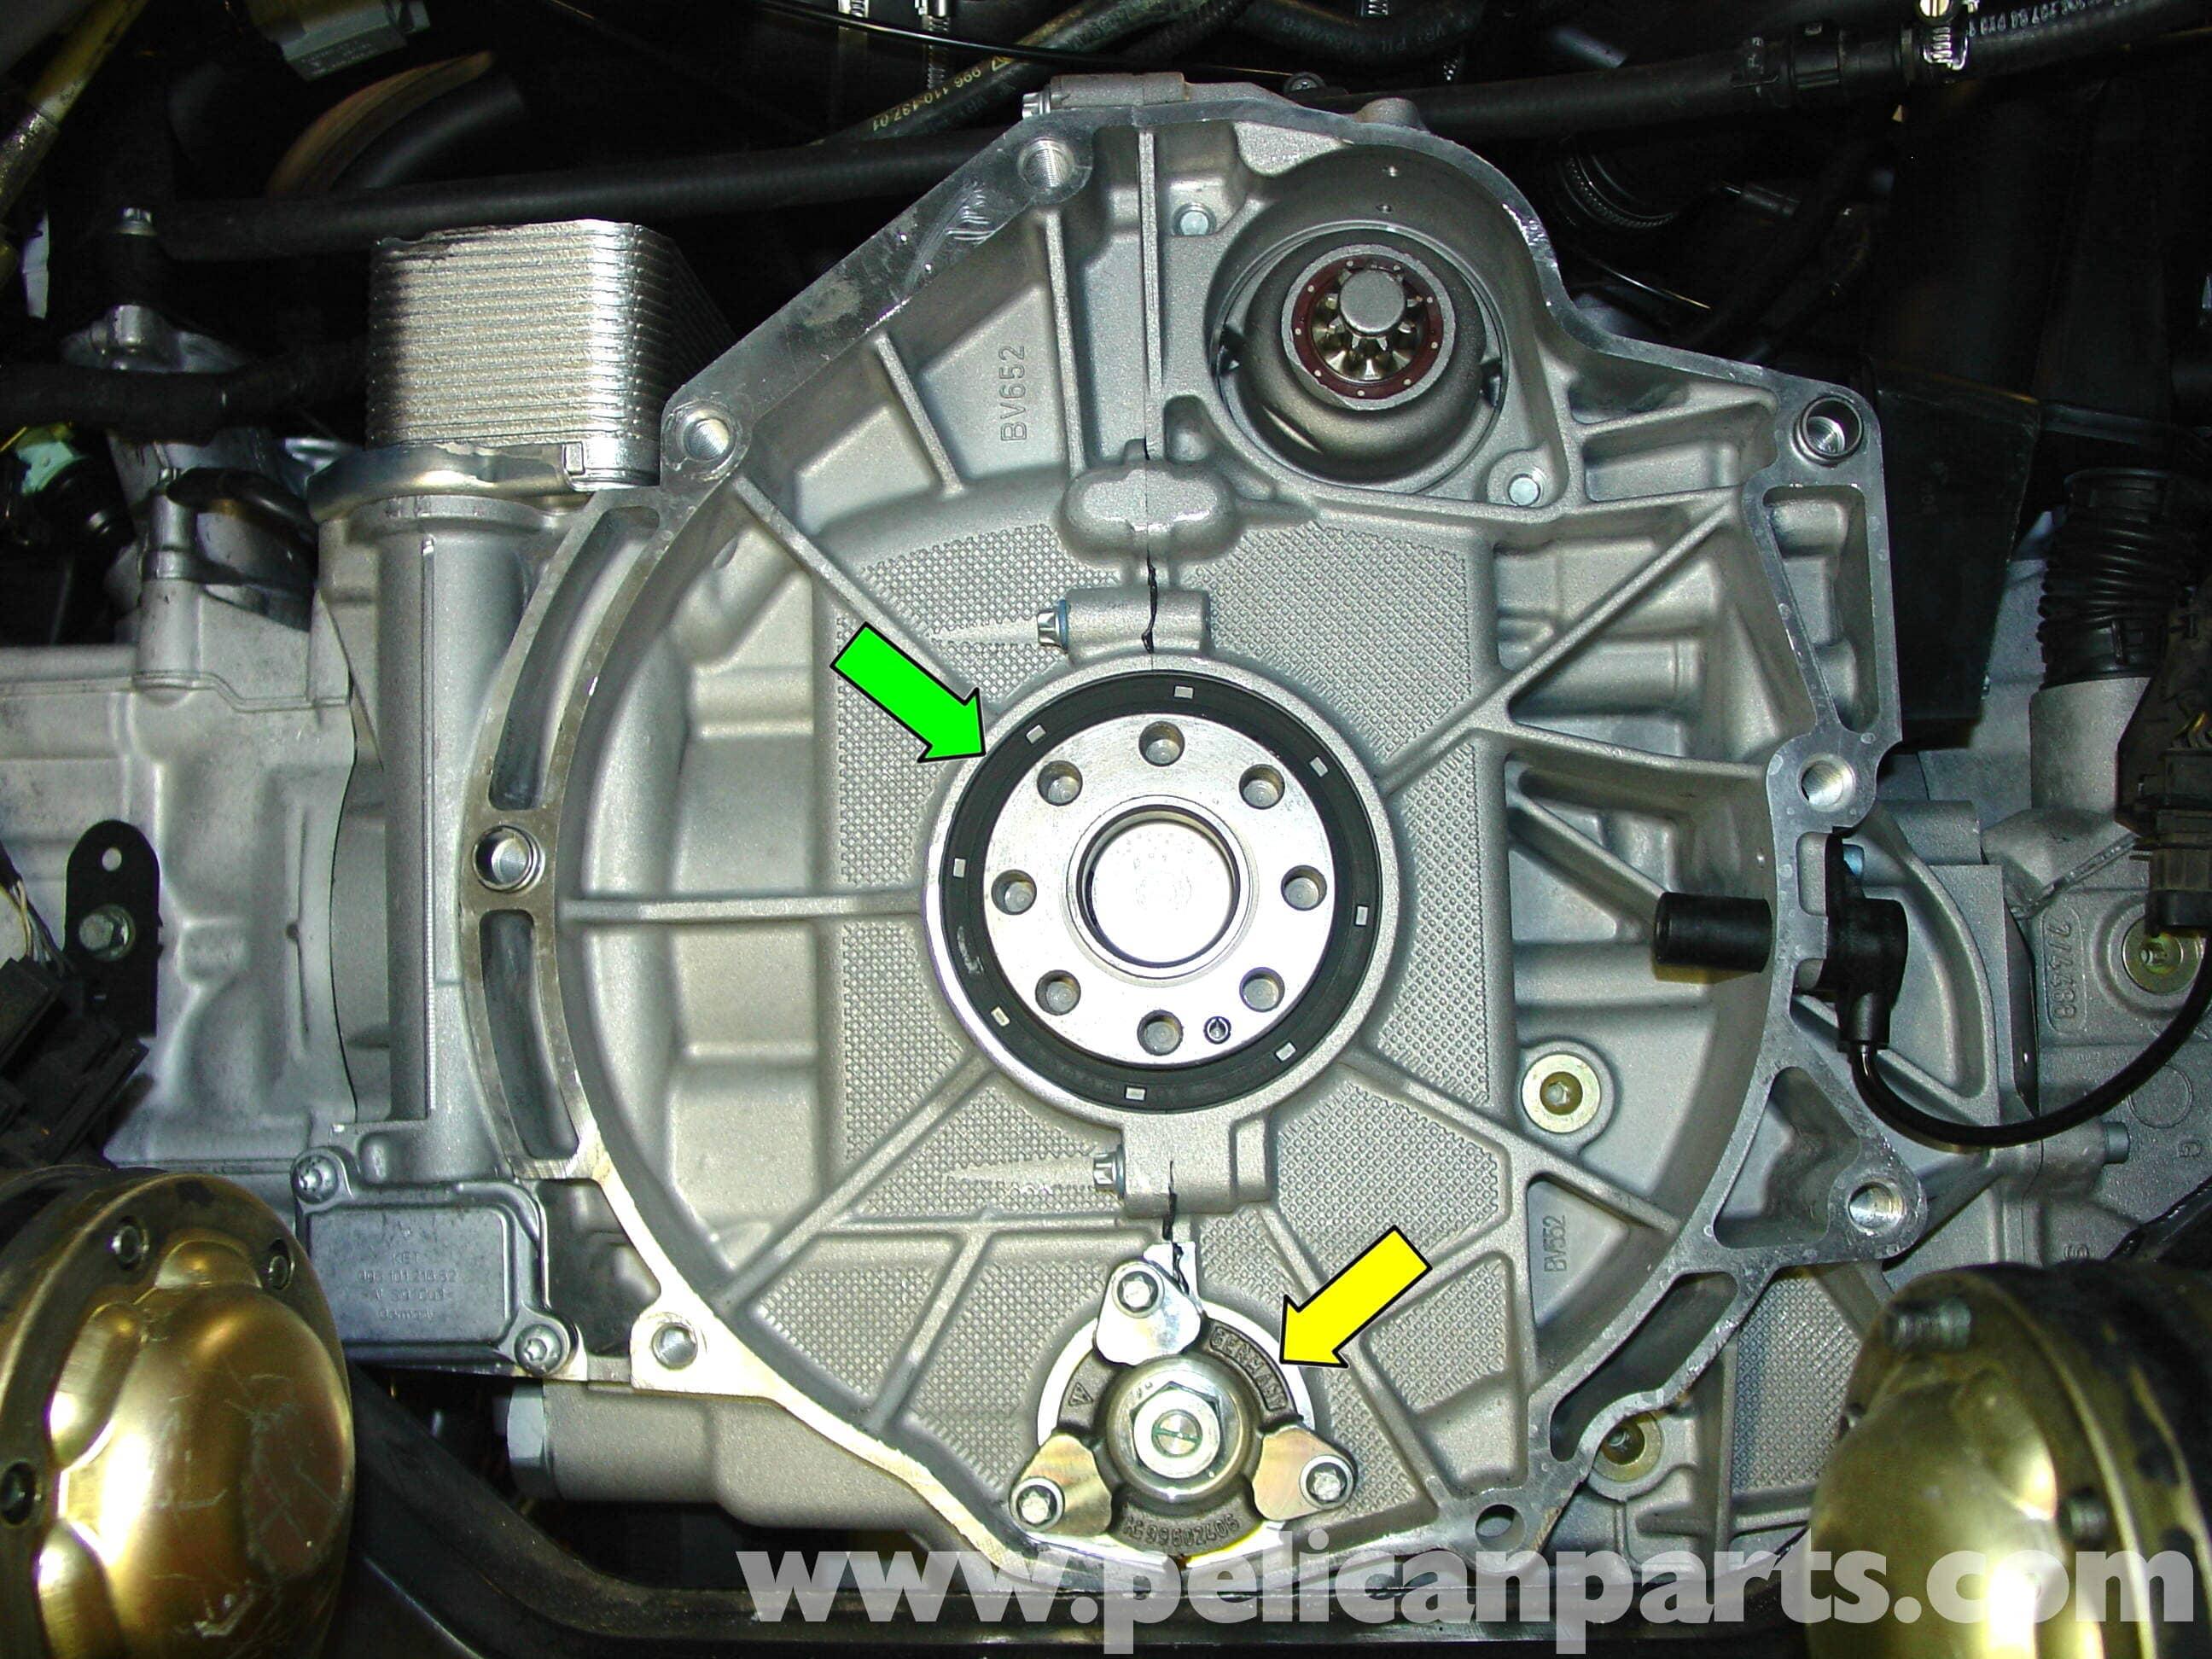 Lincoln Town Car Fuse Box Layout Porsche 911 Carrera Common Engine Problems 996 1998